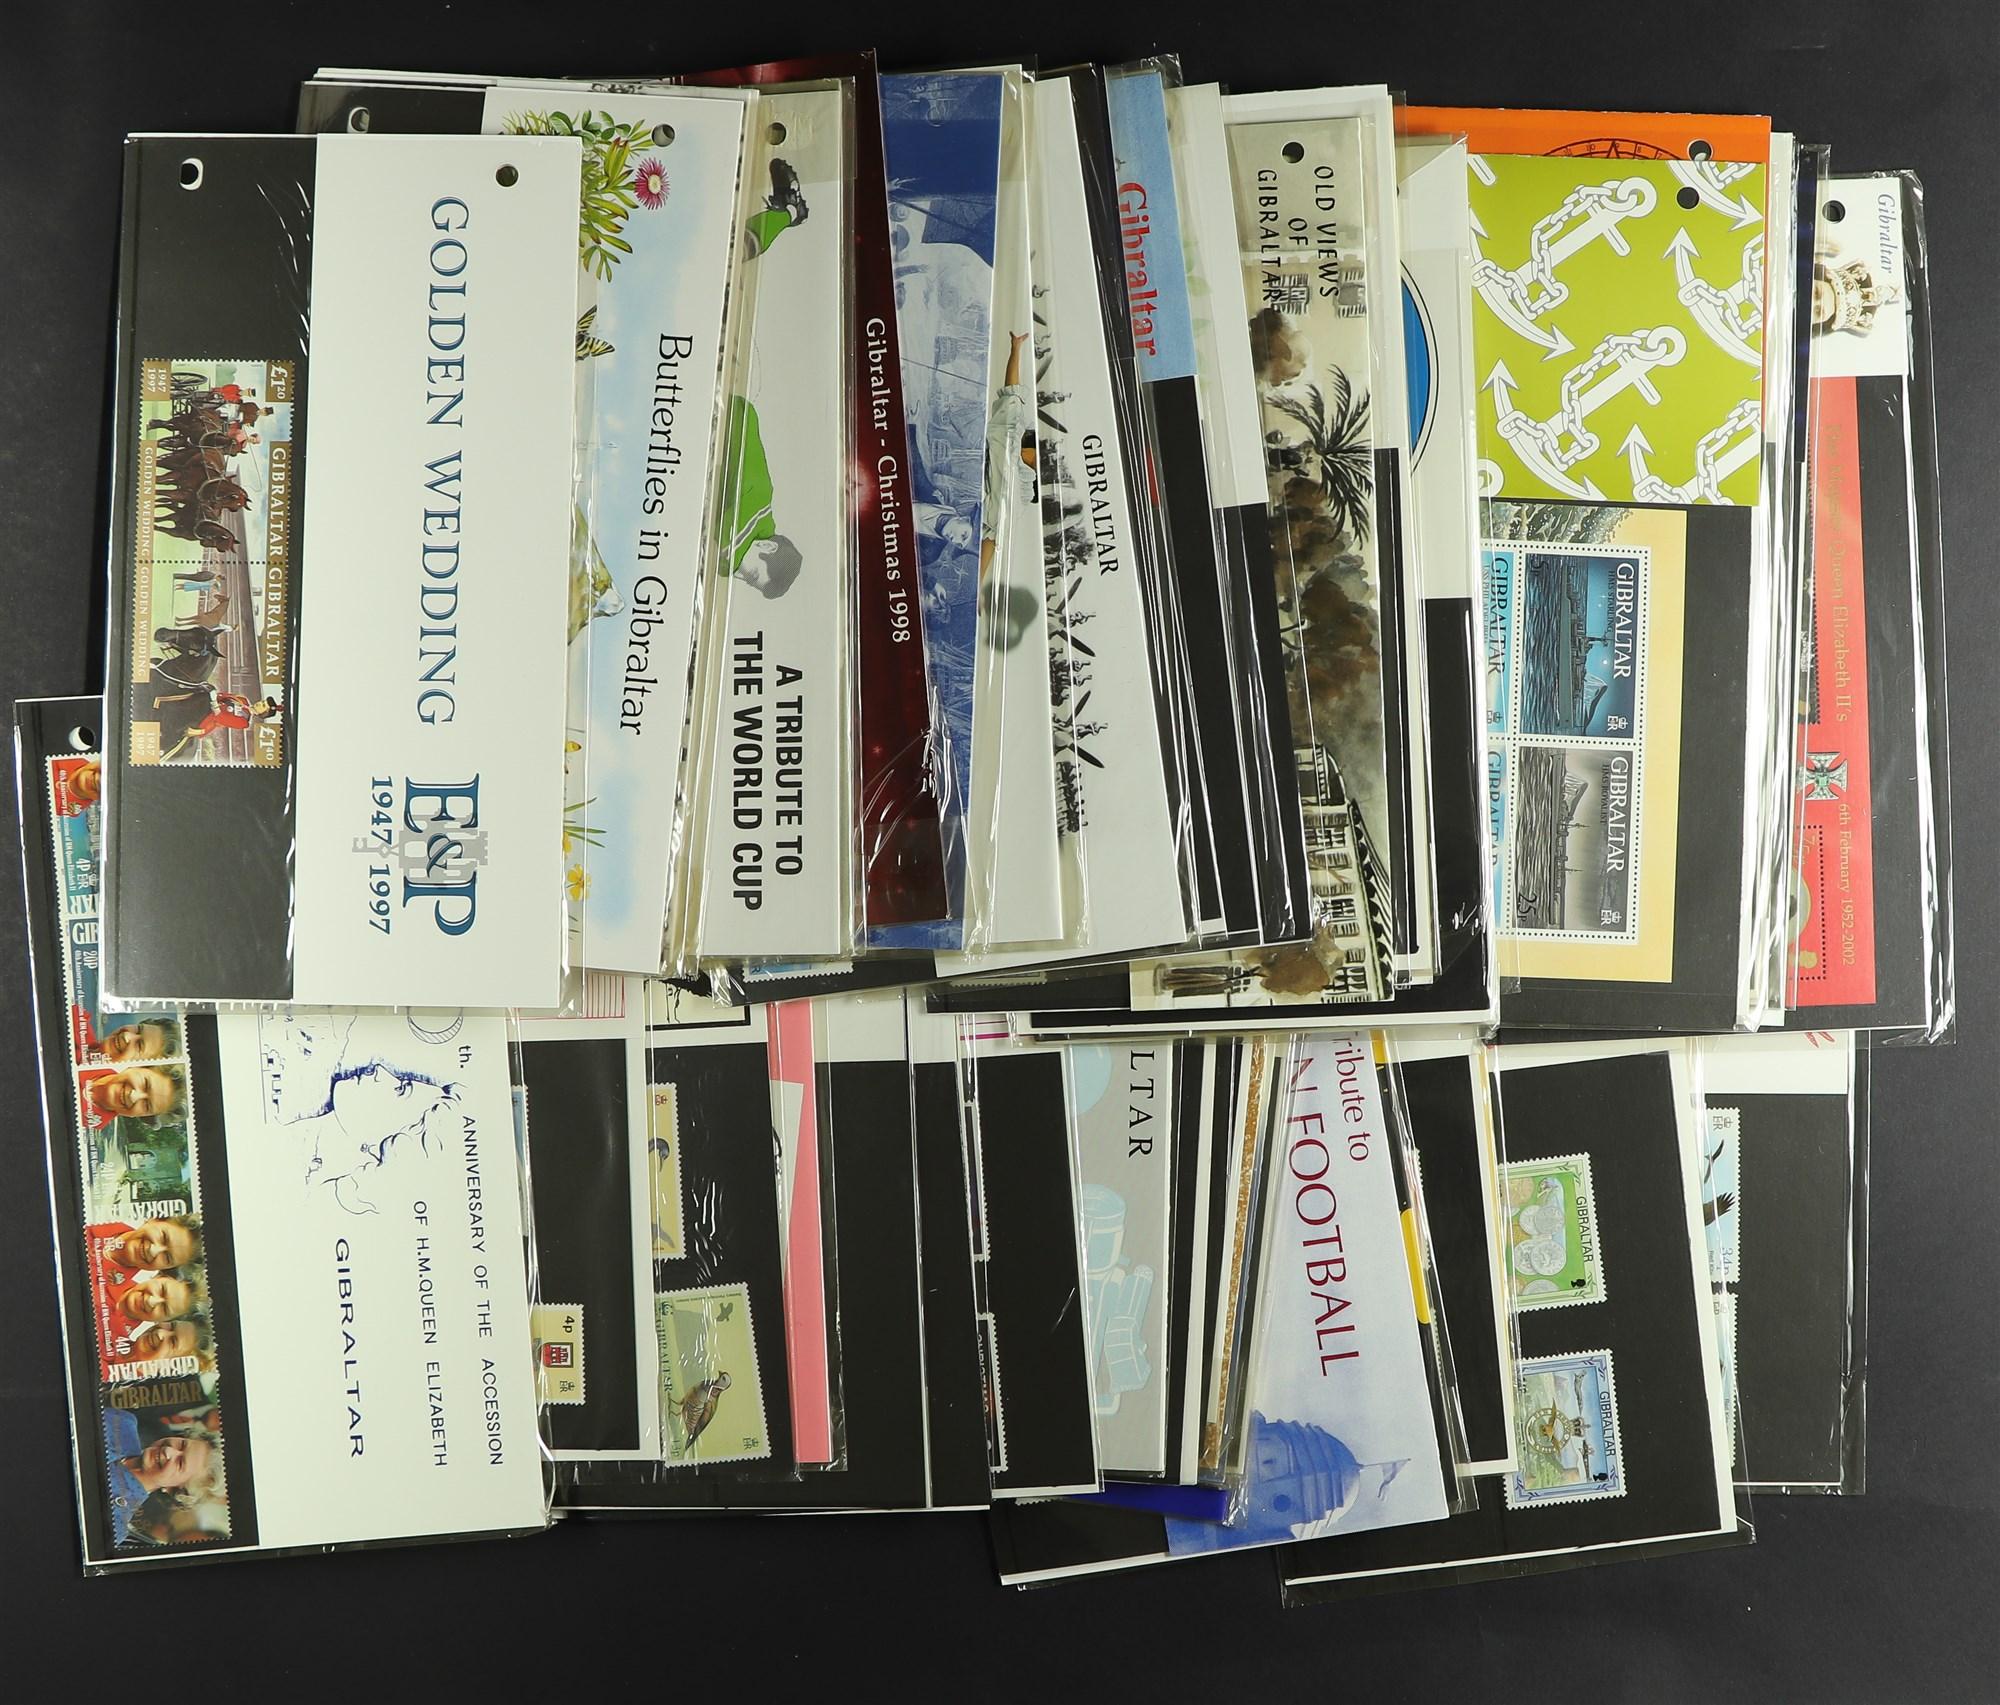 GIBRALTAR 1991-2002 PRESENTATION PACKS, incl. 1993-1995 Warships m/s's, 1993 Architecture original - Image 2 of 2